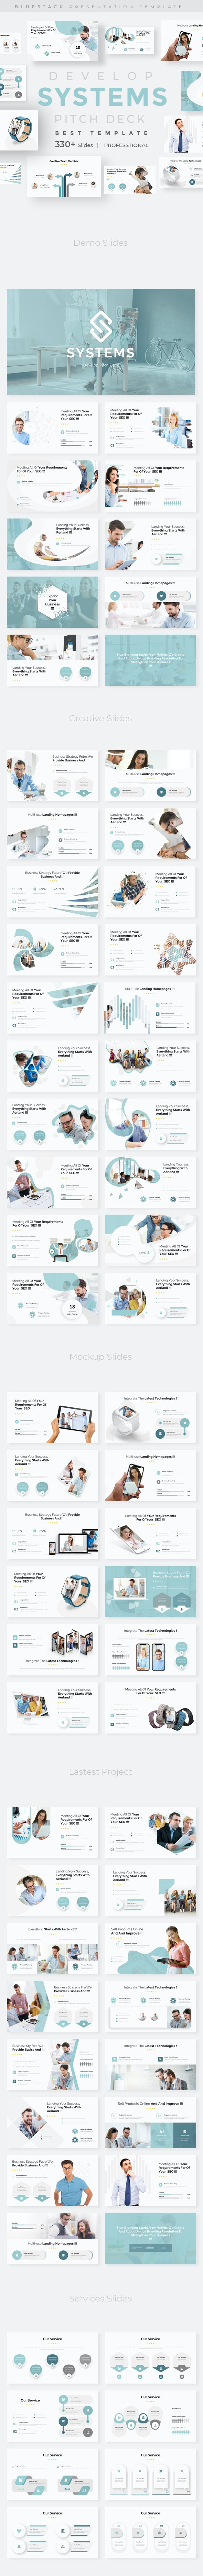 Develop Systems Pitch Deck Google Slide Template - Google Slides Presentation Templates